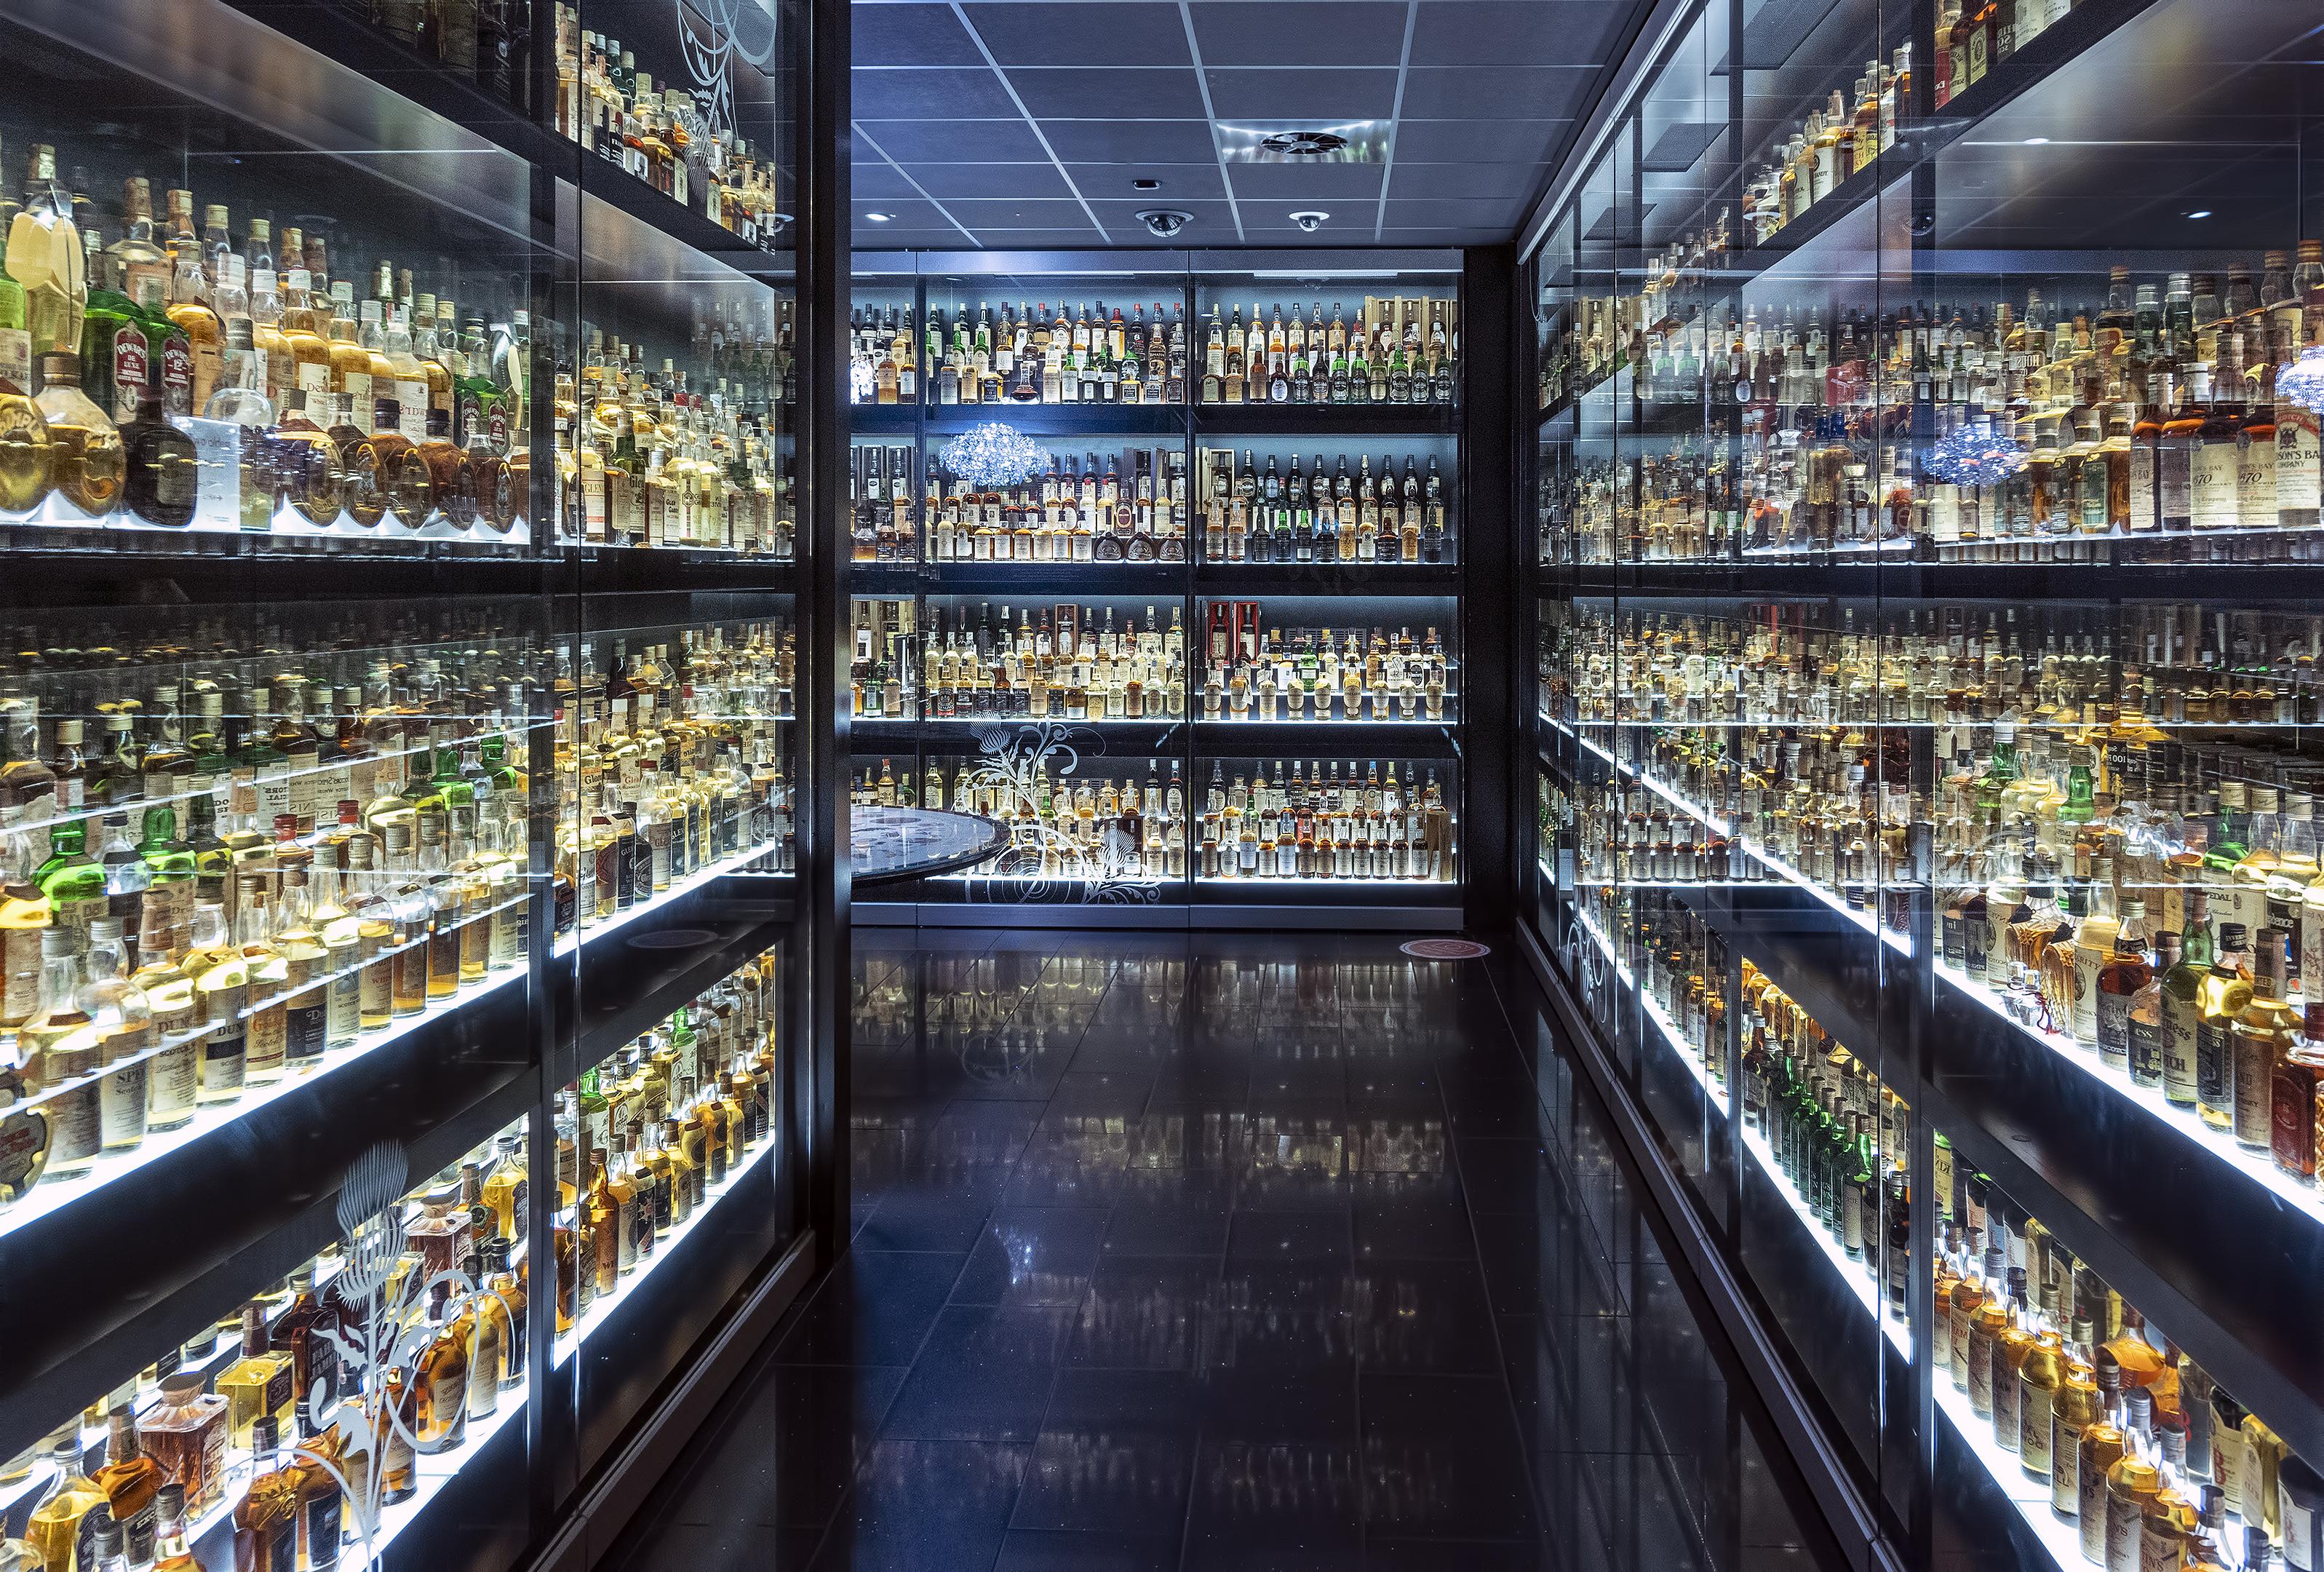 The Scotch Whisky Experience edinburgh scotland collection